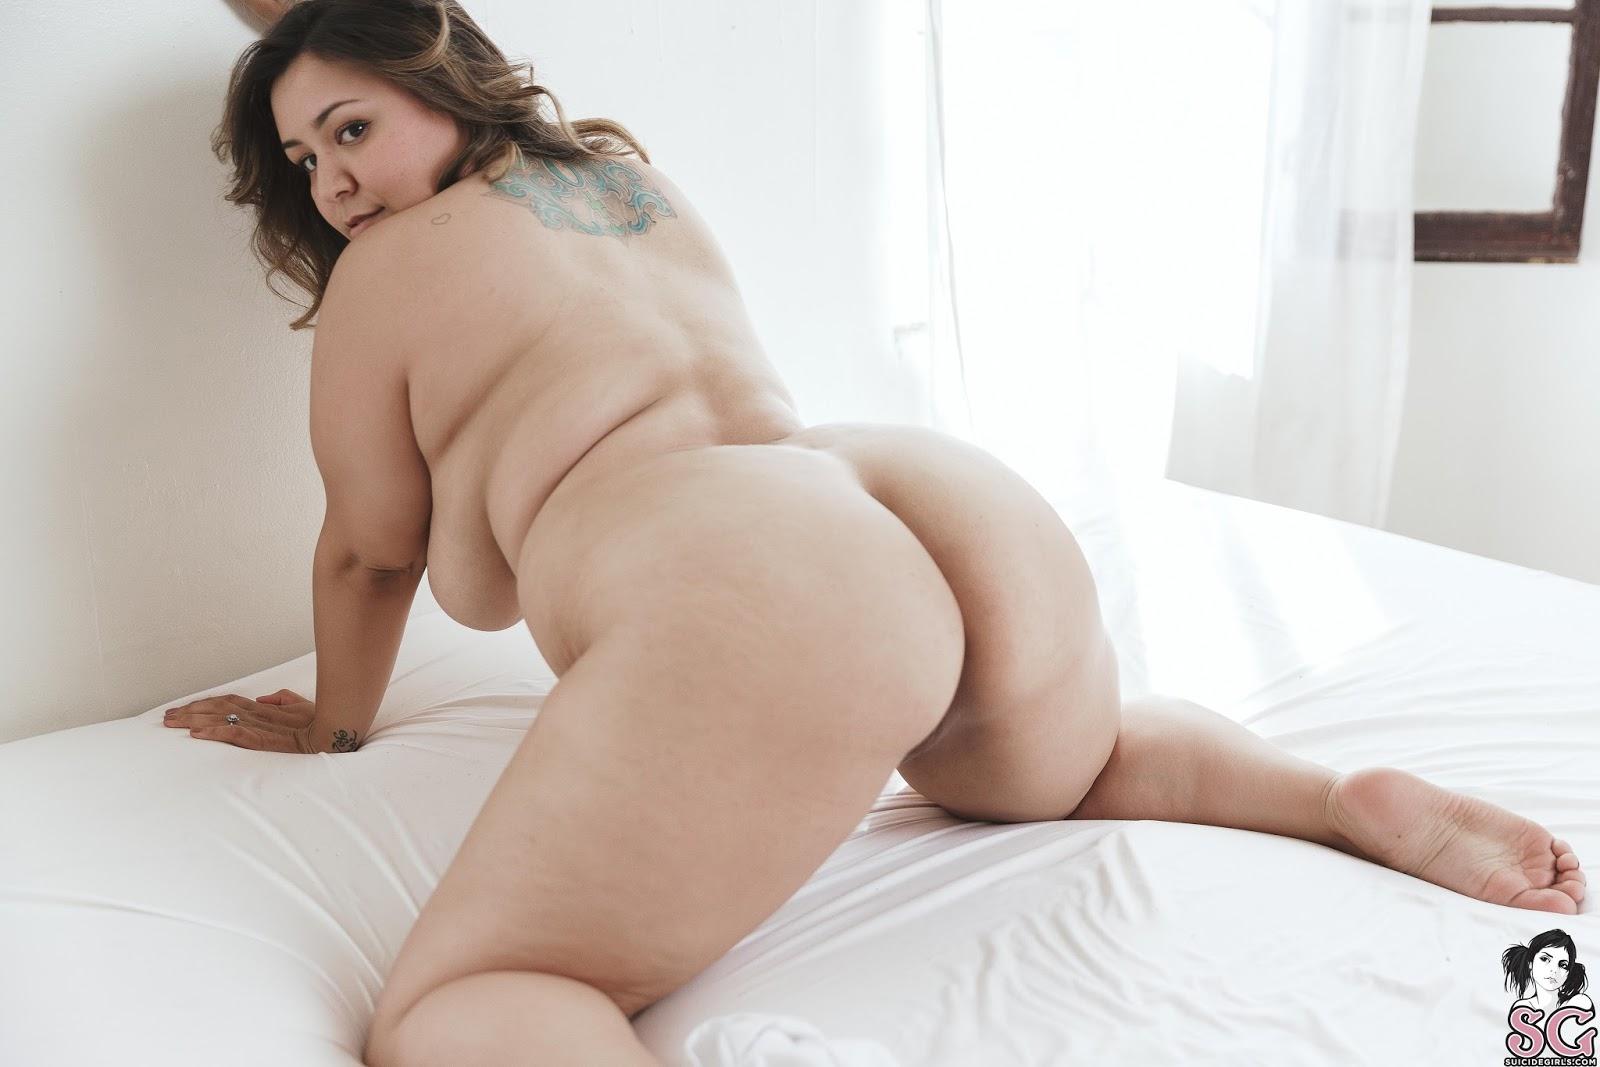 Hot emo lesbians girls naked